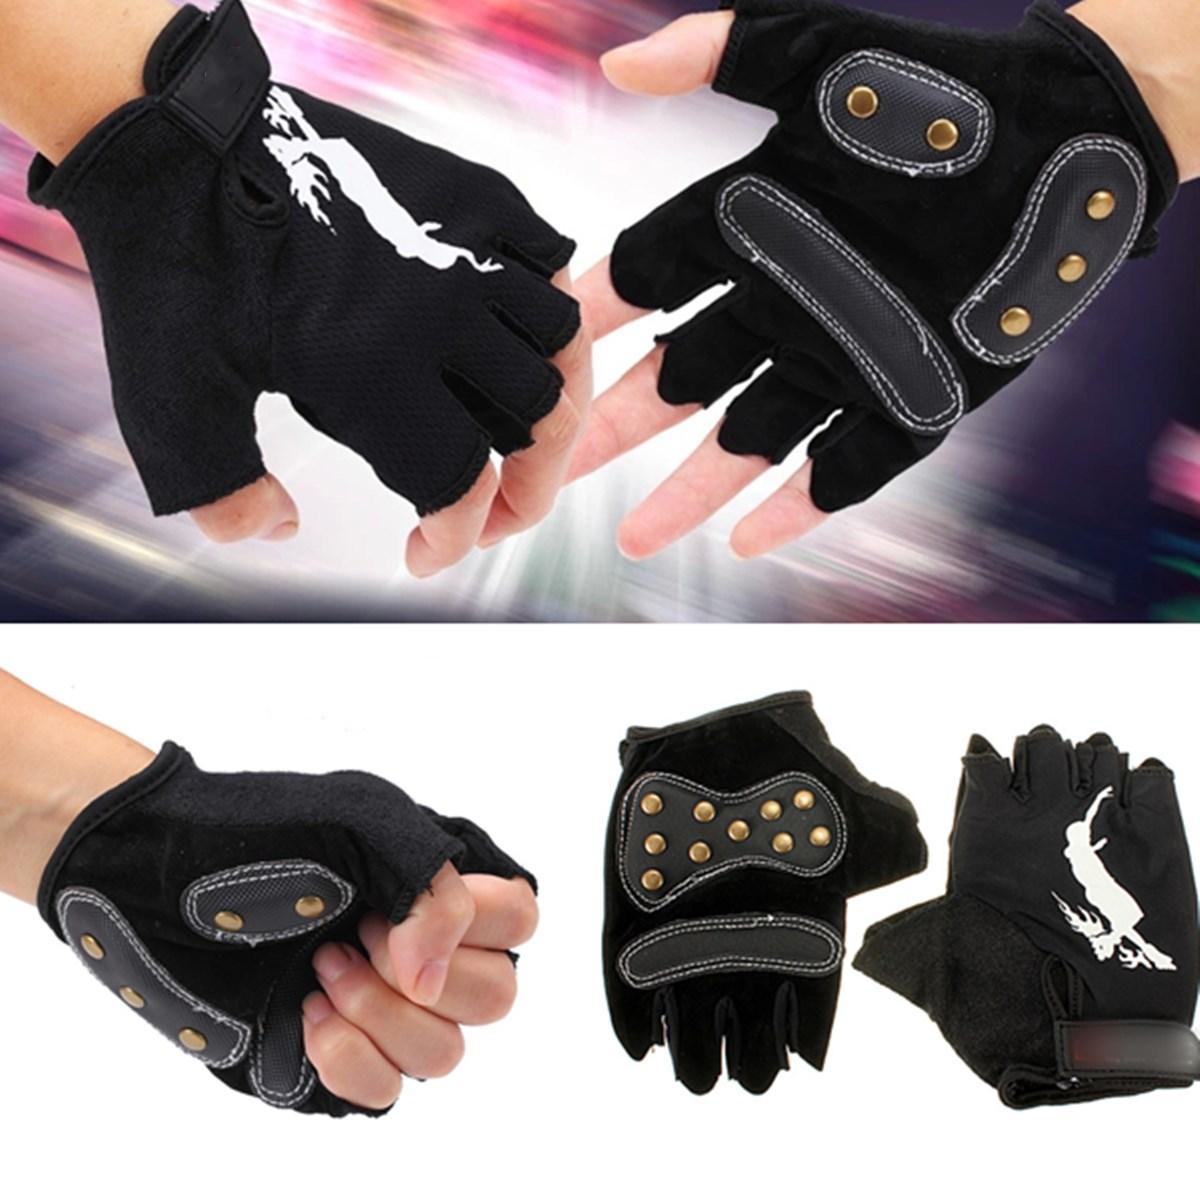 Skateboard Gloves Longboard Gloves Half Finger Fingerless Gloves For Longboard Skateboard Hunting Outdoor Sports